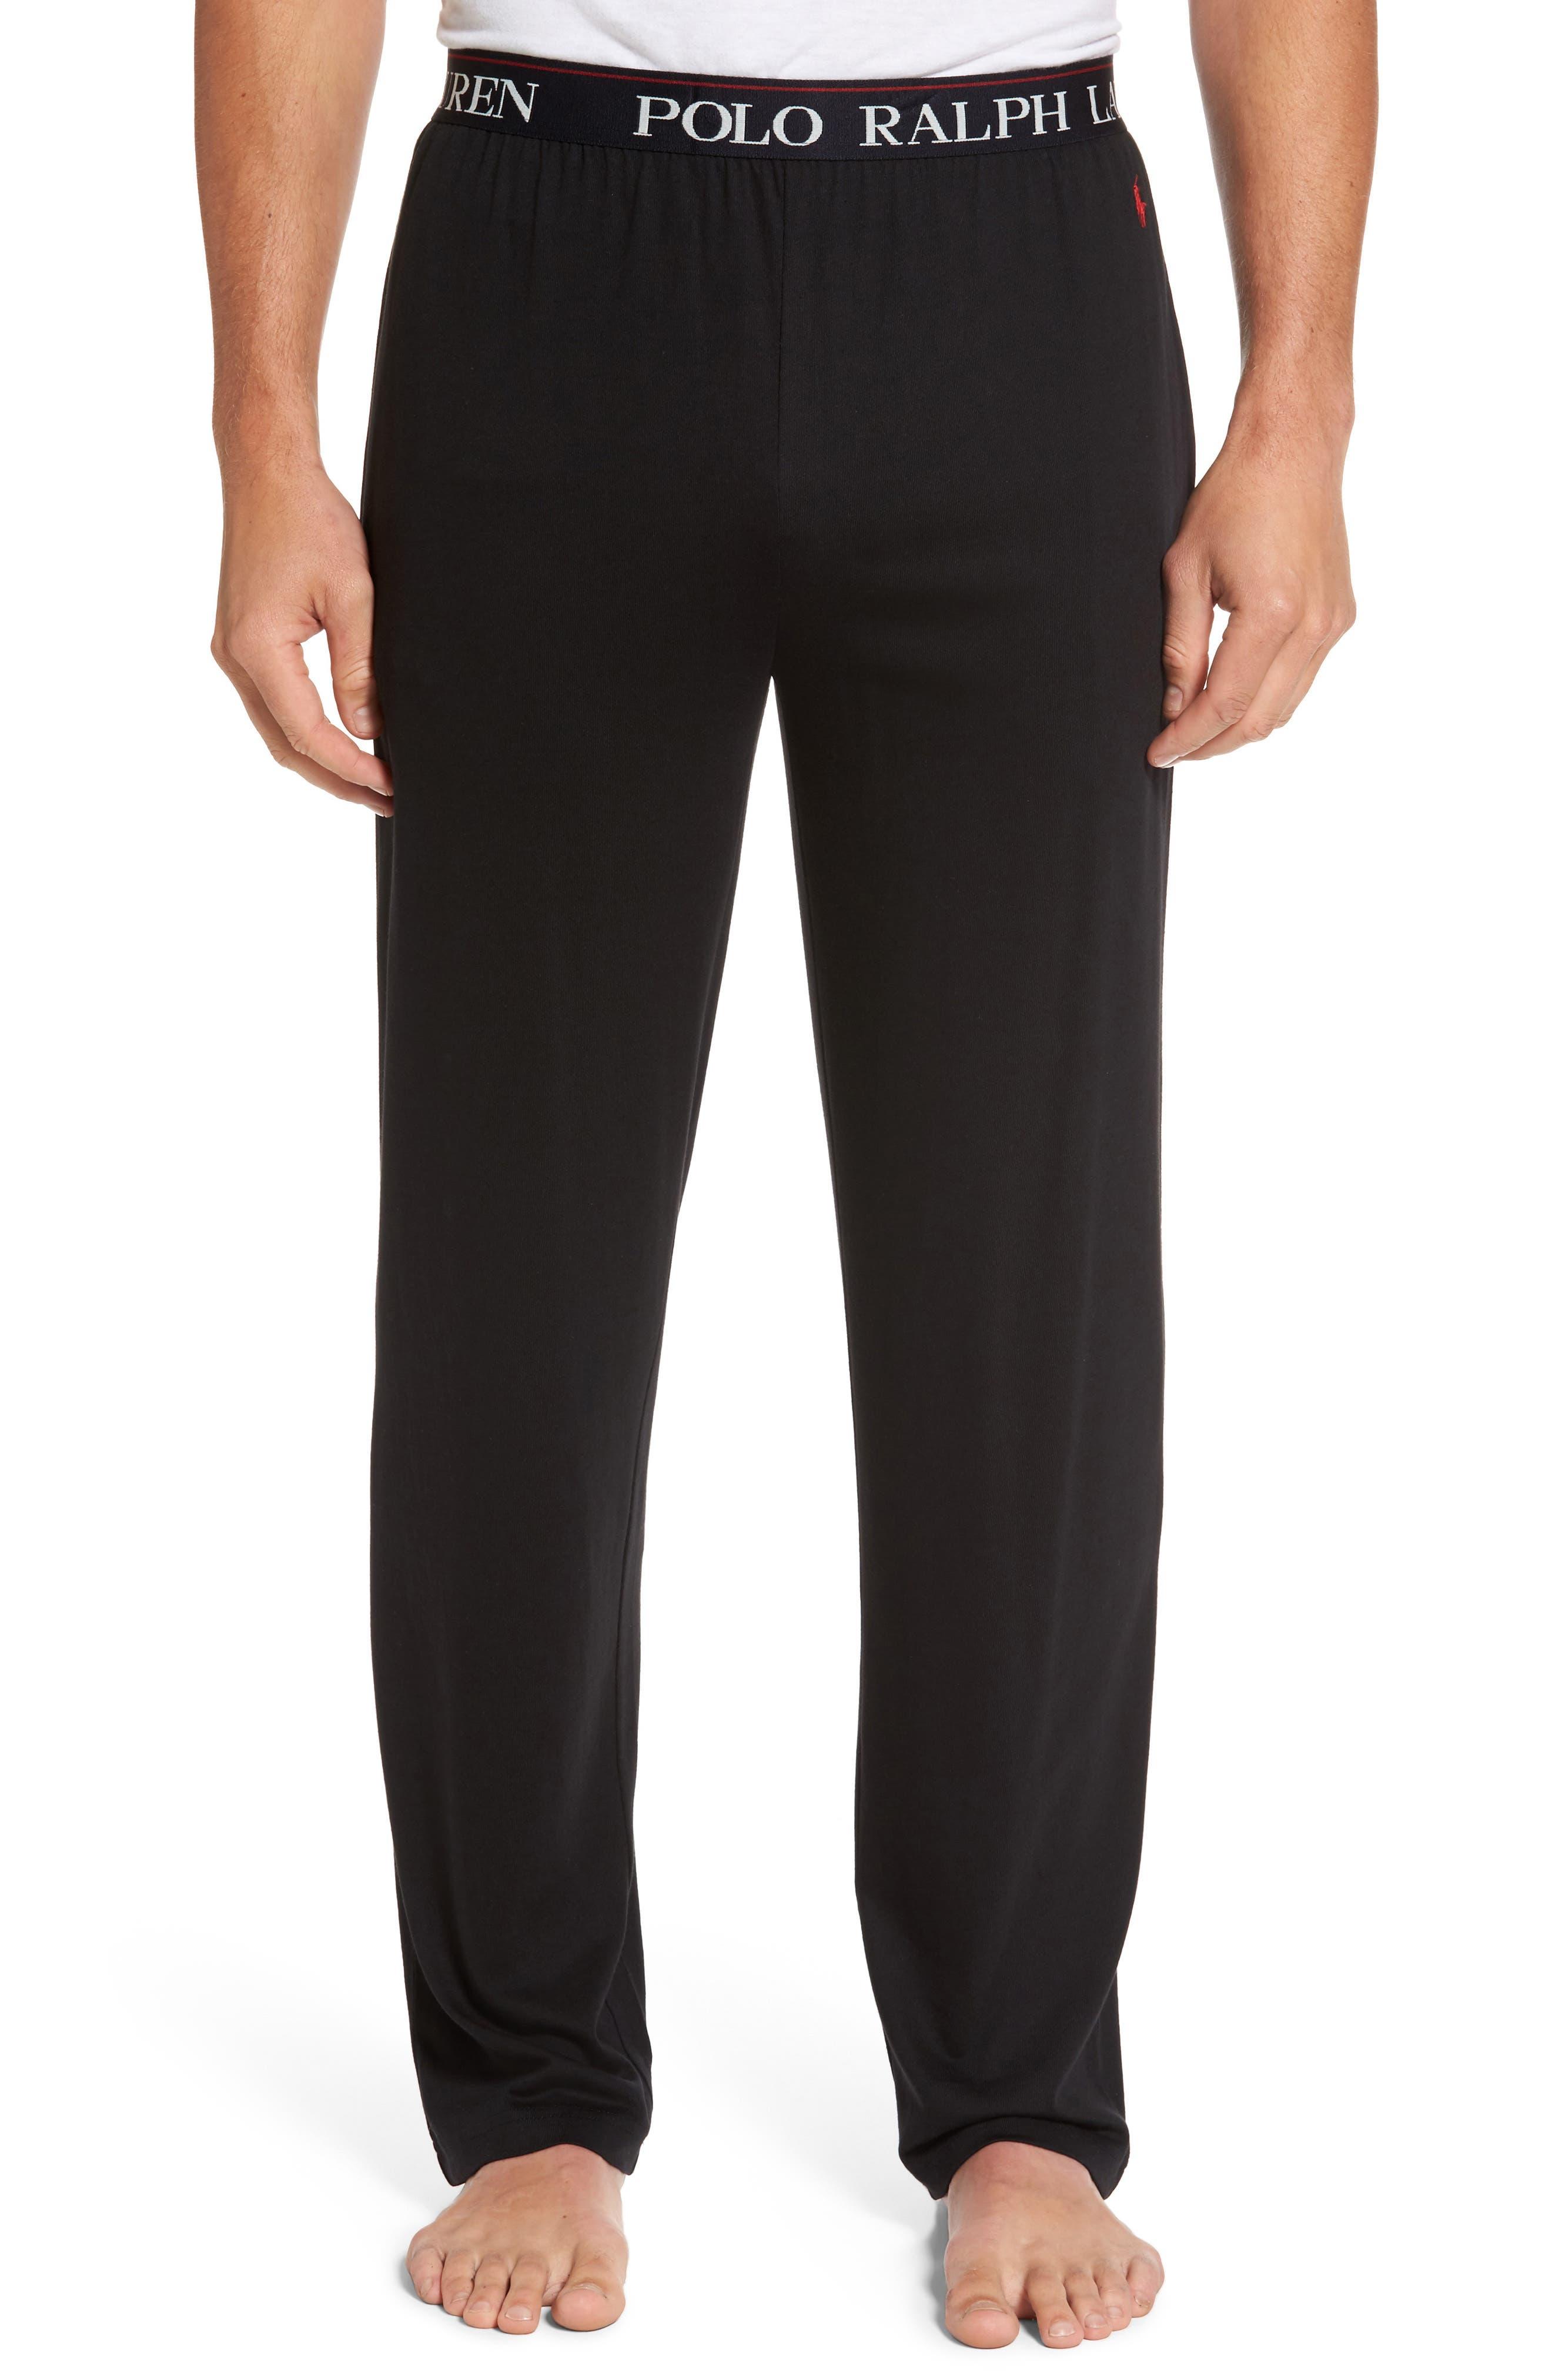 POLO RALPH LAUREN, Cotton & Modal Lounge Pants, Main thumbnail 1, color, POLO BLACK